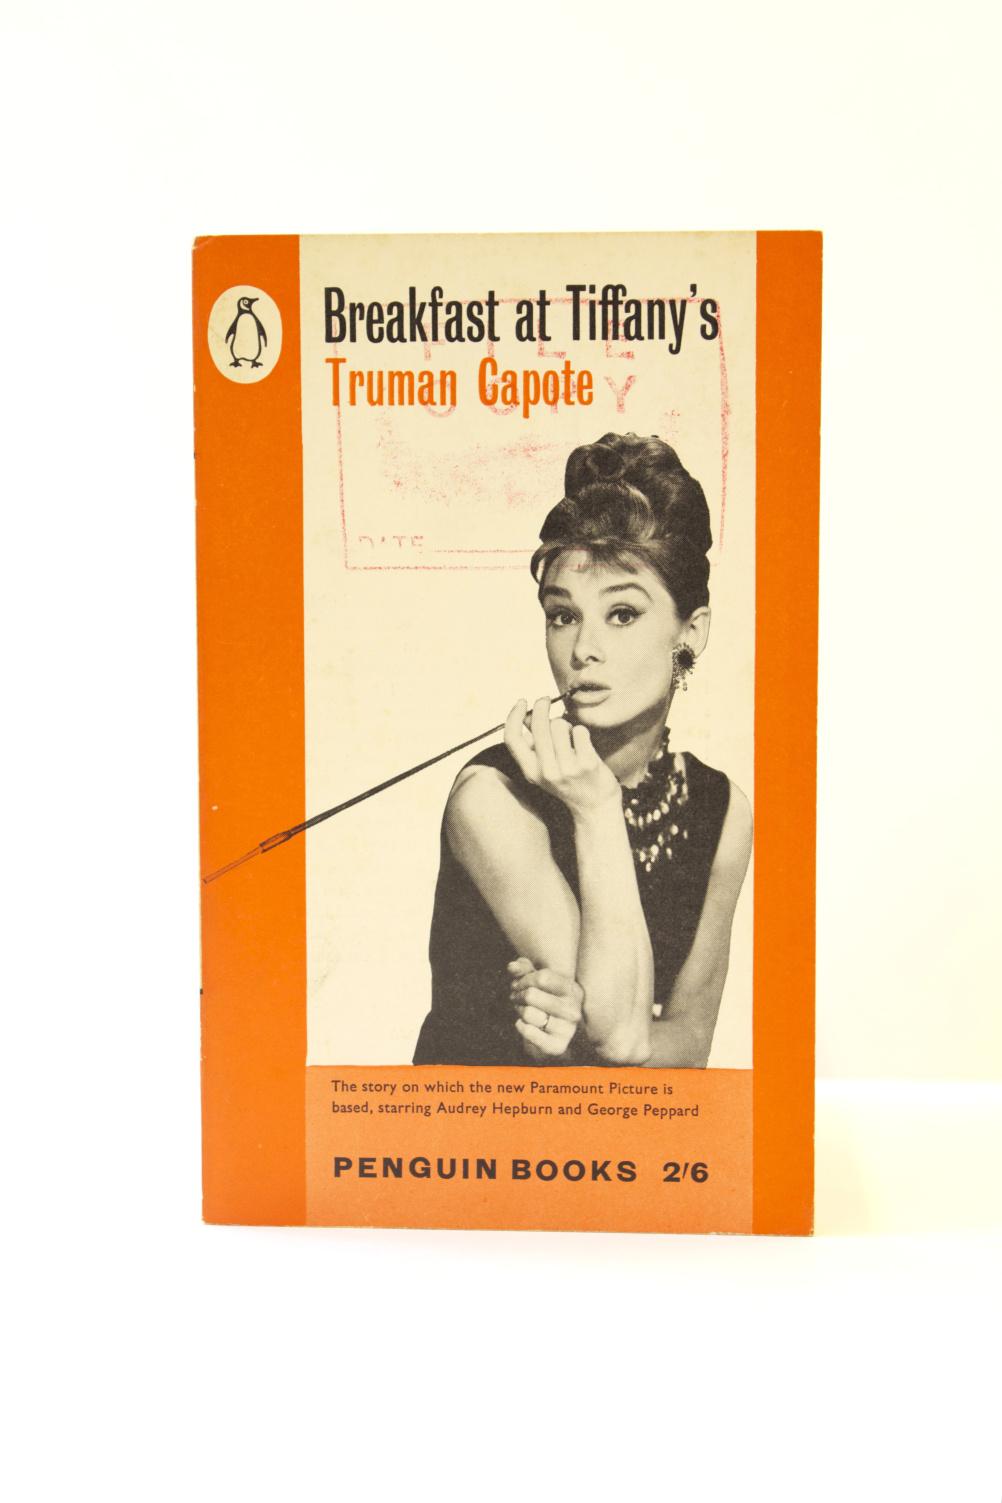 Breakfast At Tiffany's, Truman Capote